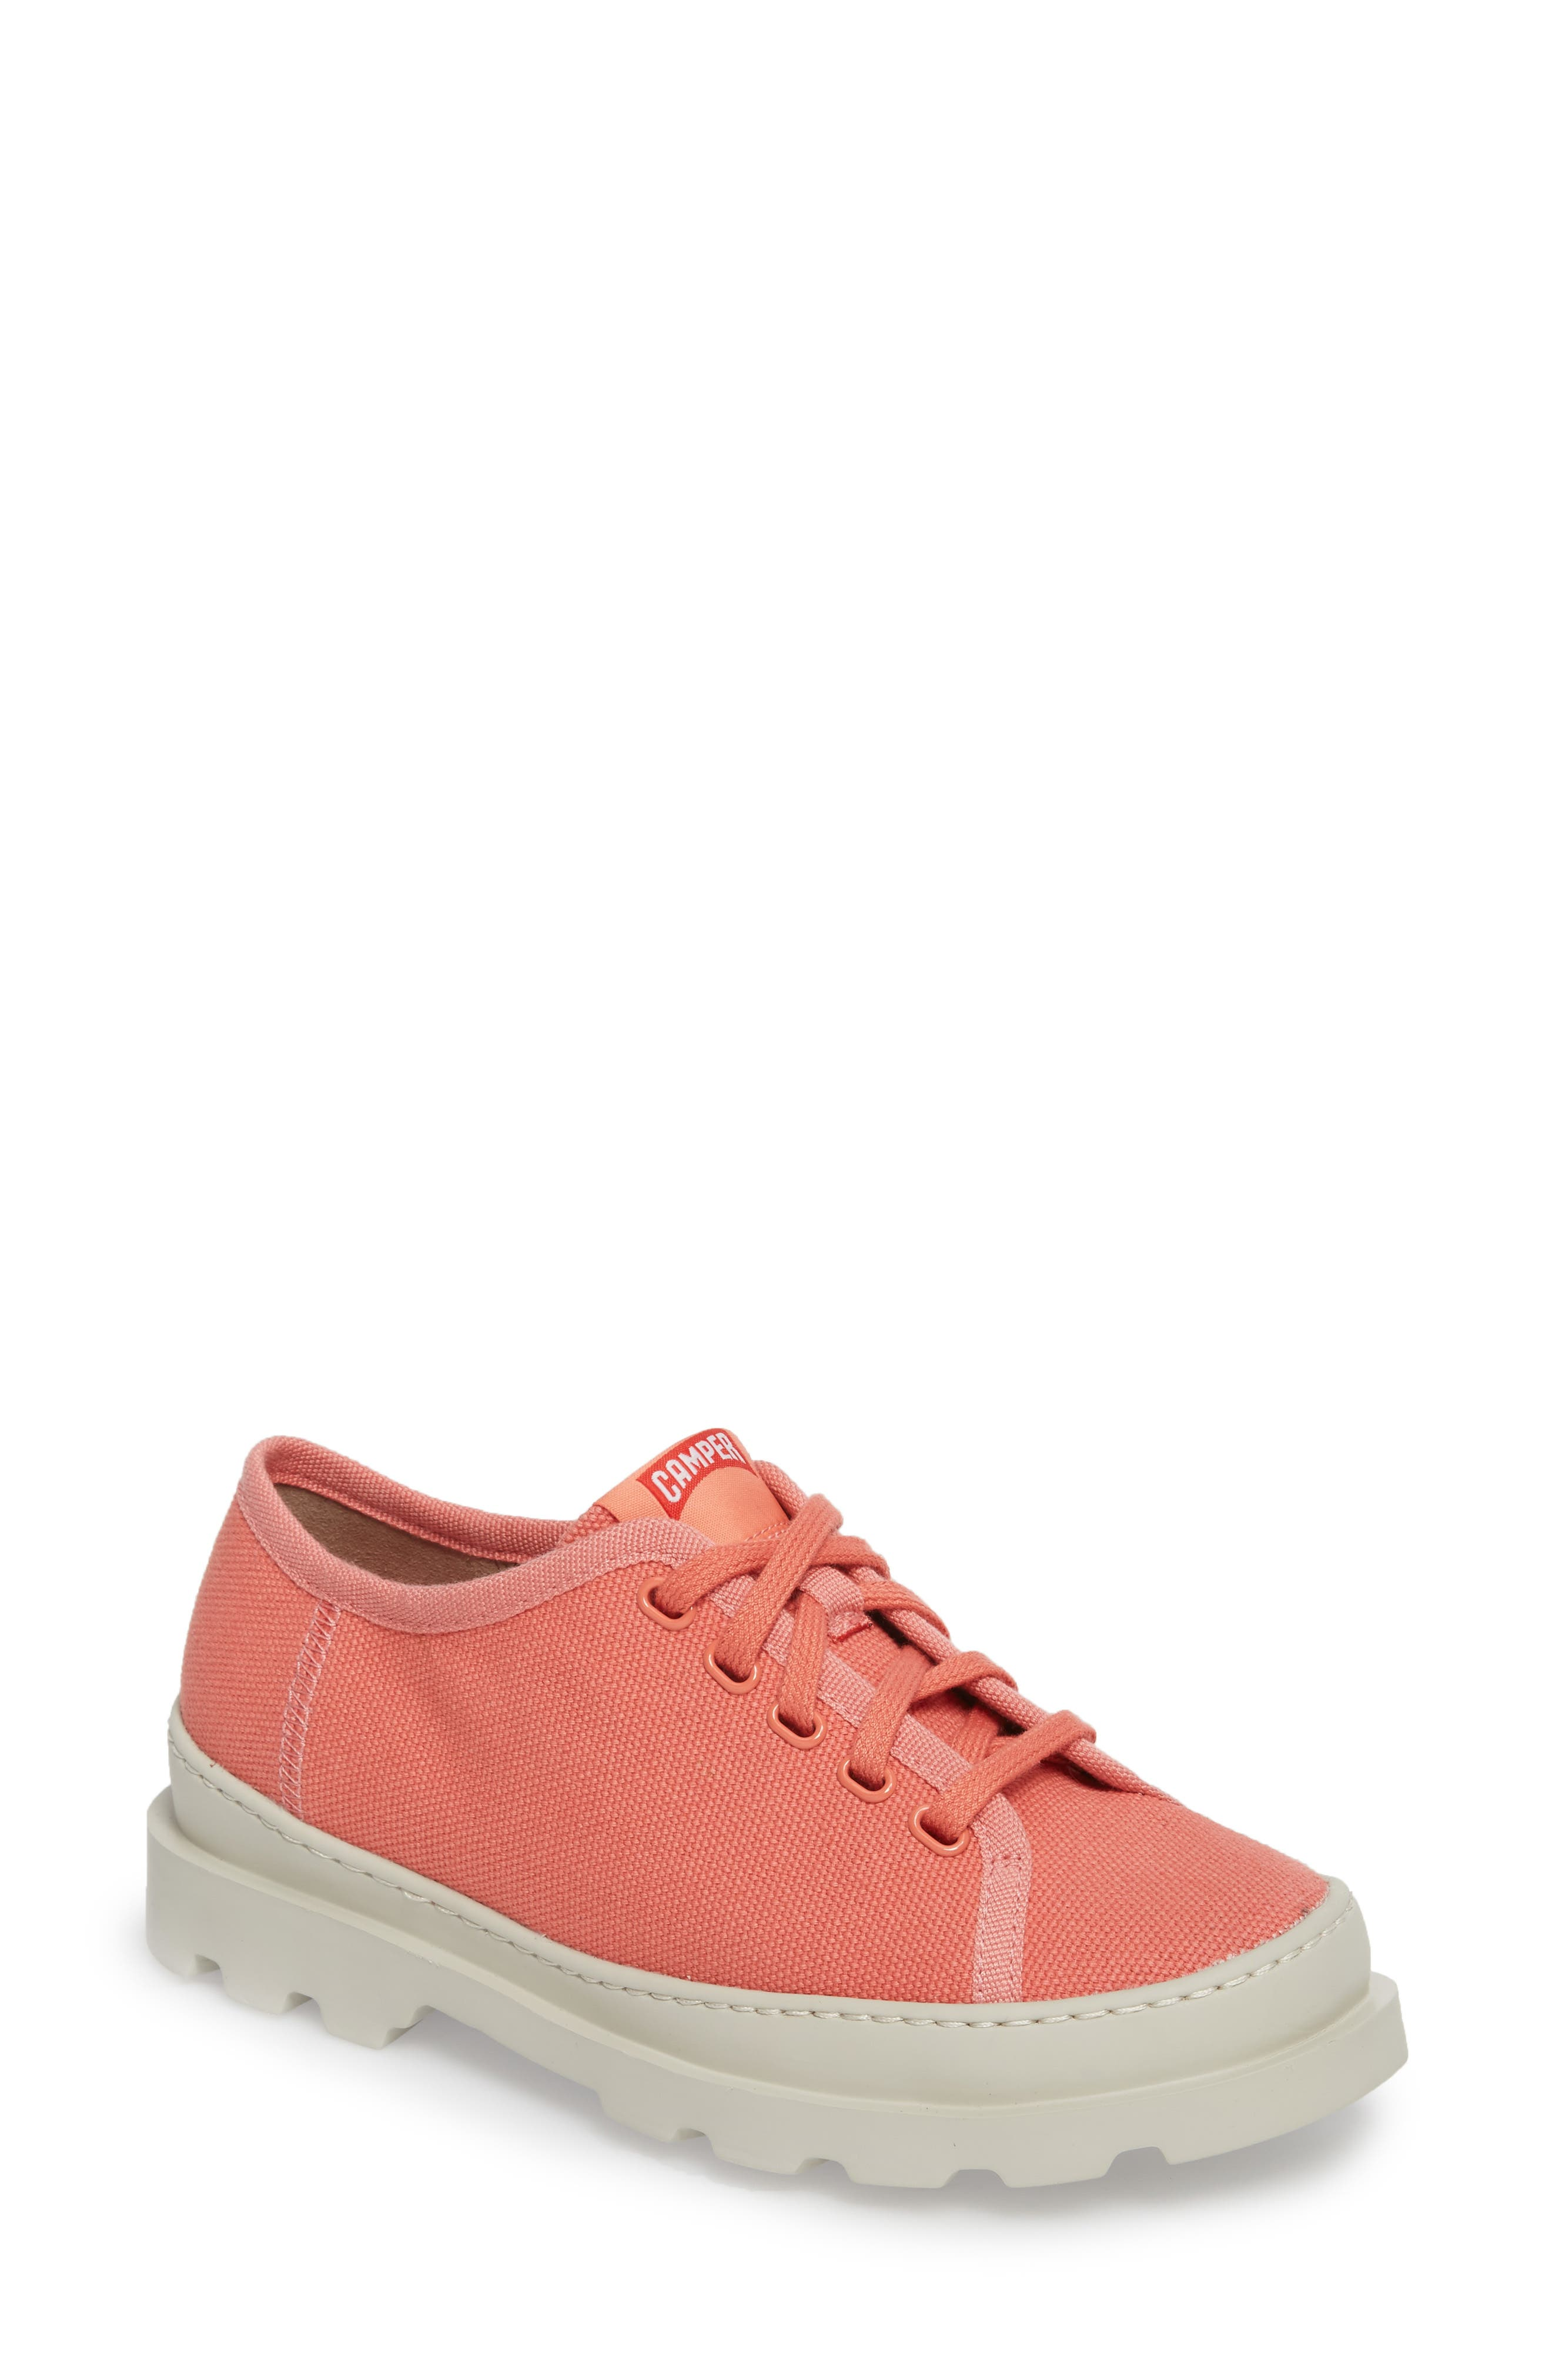 Brutus Lugged Platform Sneaker,                             Main thumbnail 1, color,                             Pink